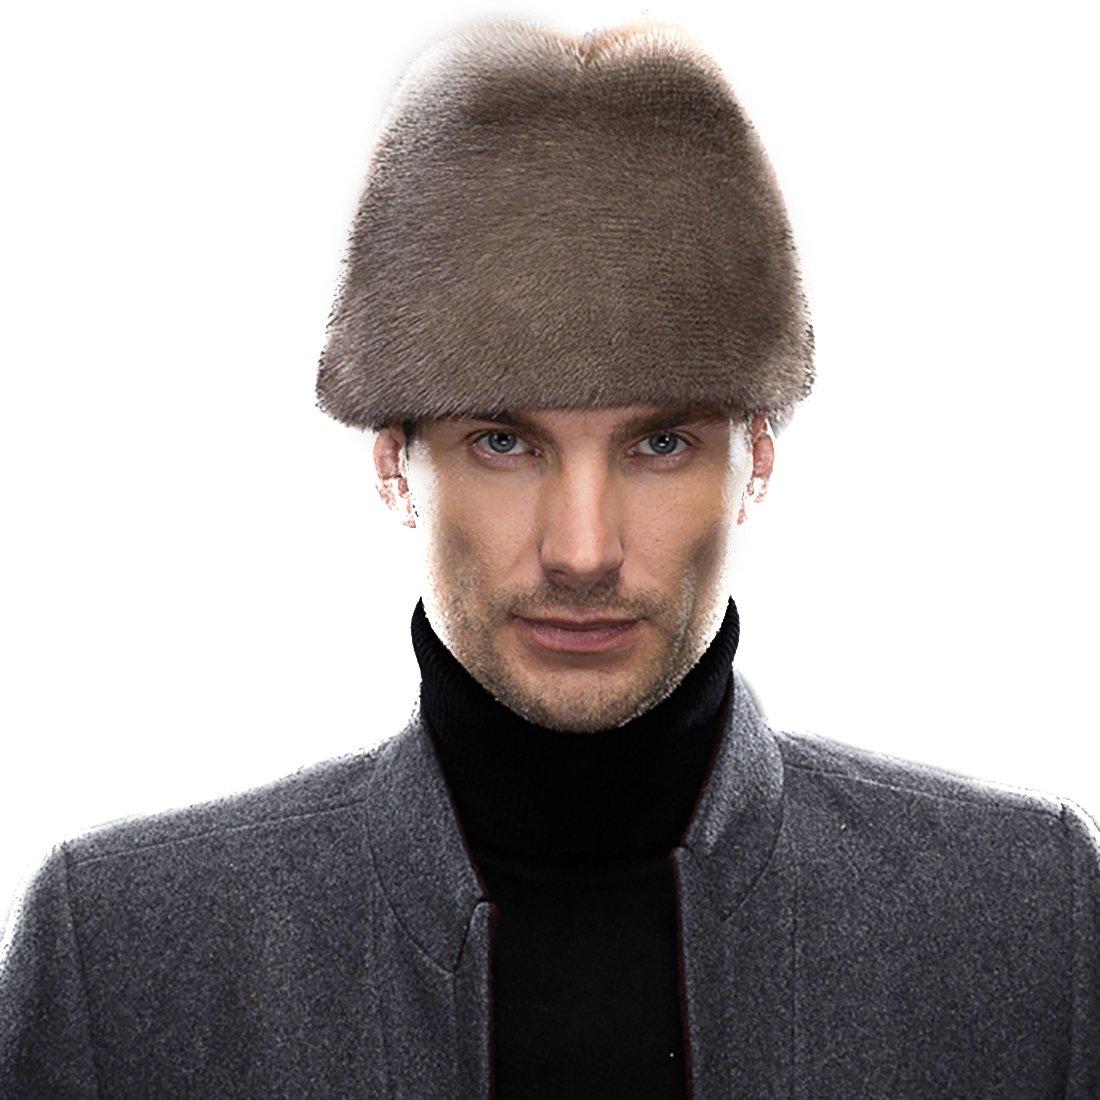 URSFUR Men's Mink Full Fur Russian Cossack Hat Fedora Cap